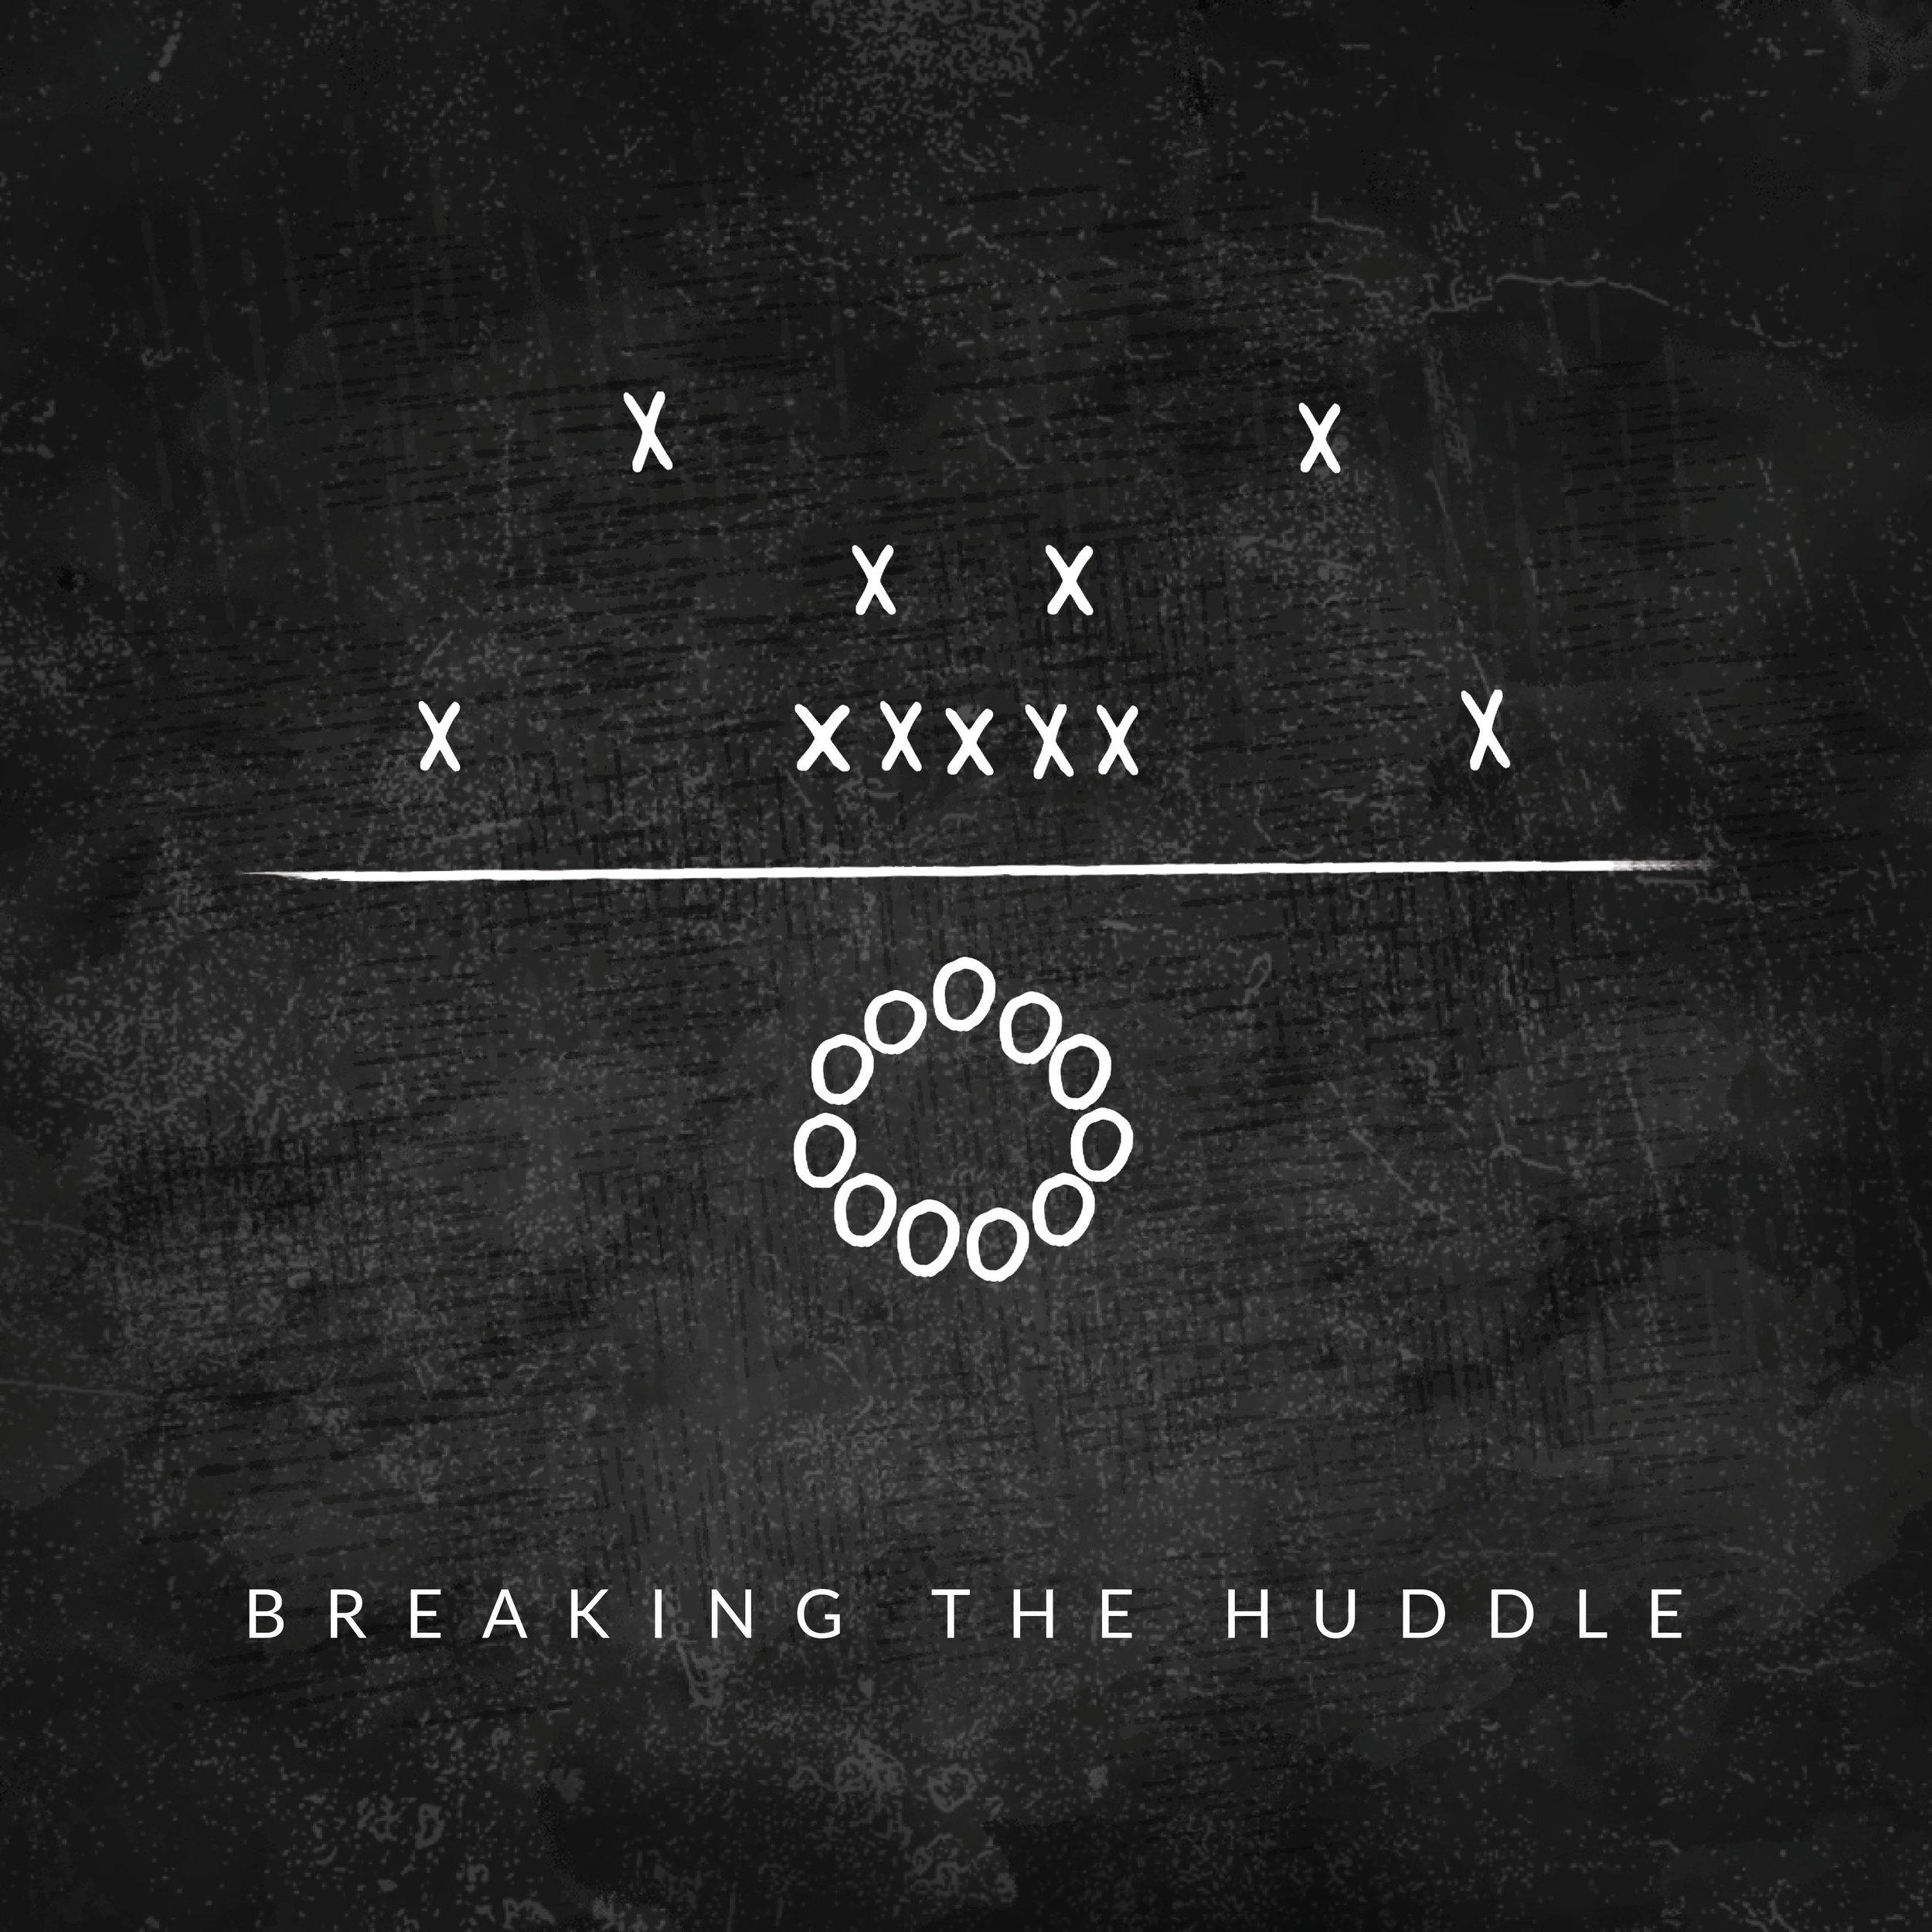 Breaking the Huddle_2.jpg